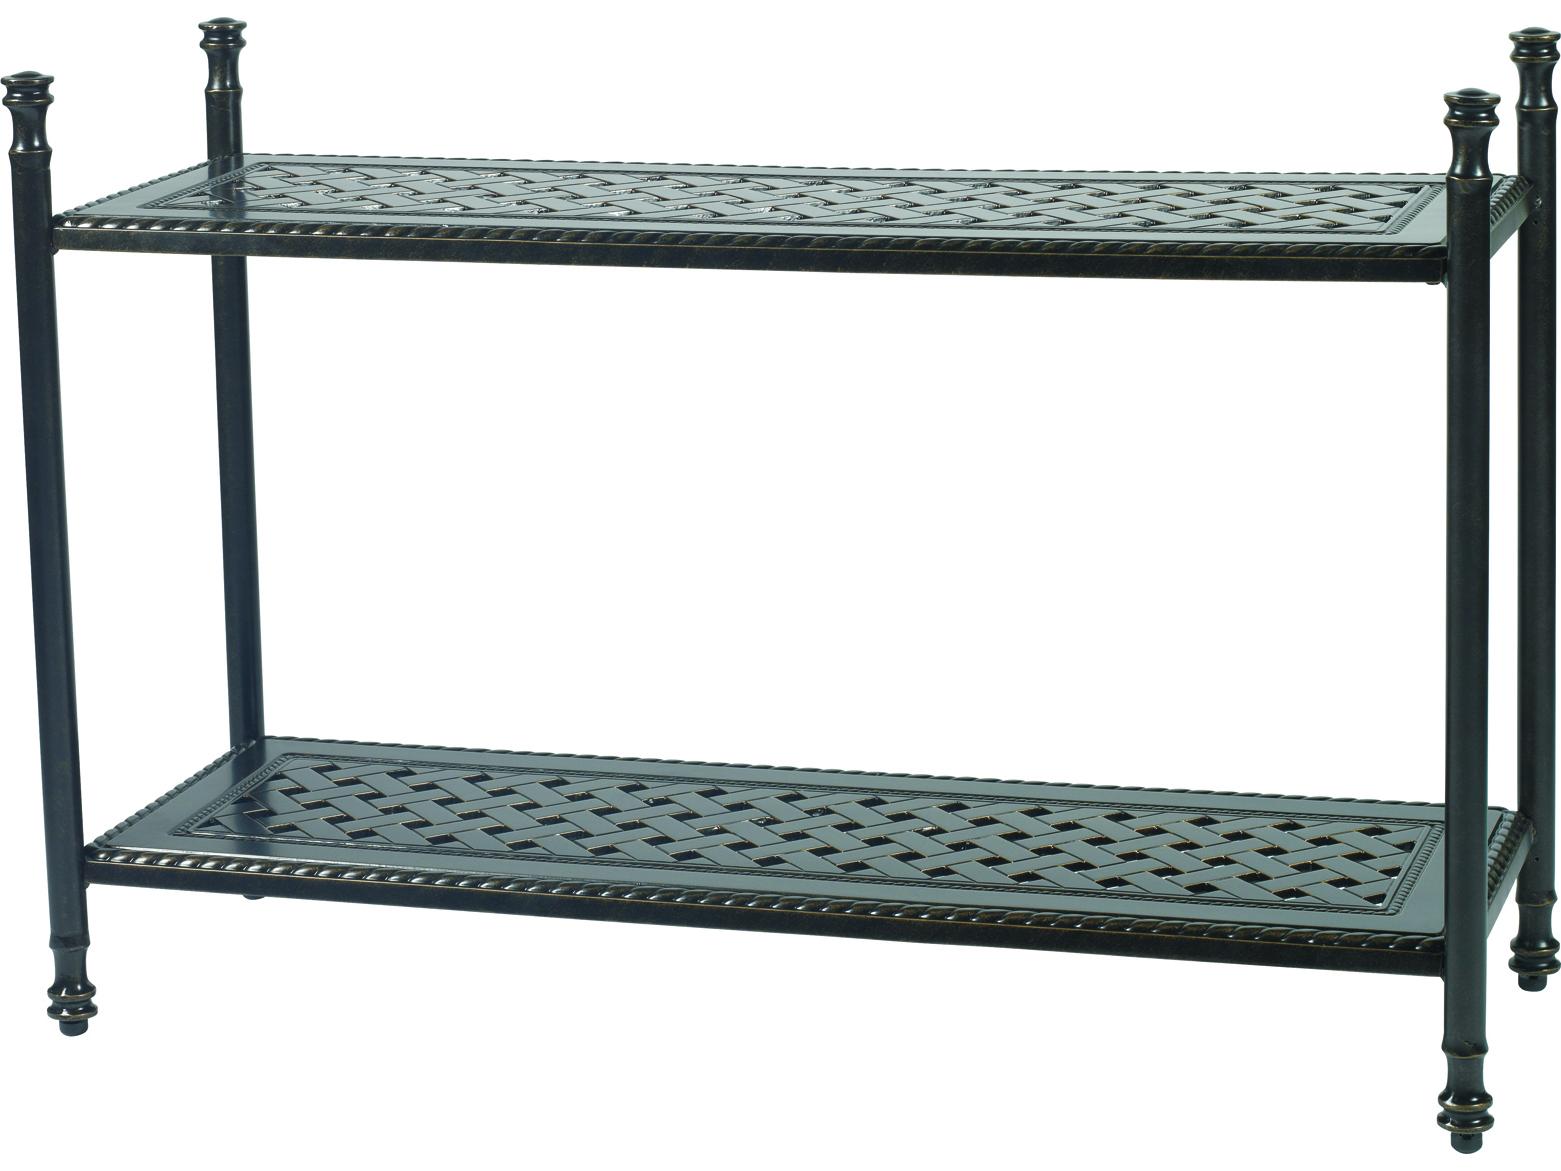 Gensun Grand Terrace Accessories Cast Aluminum 47 5 X 17